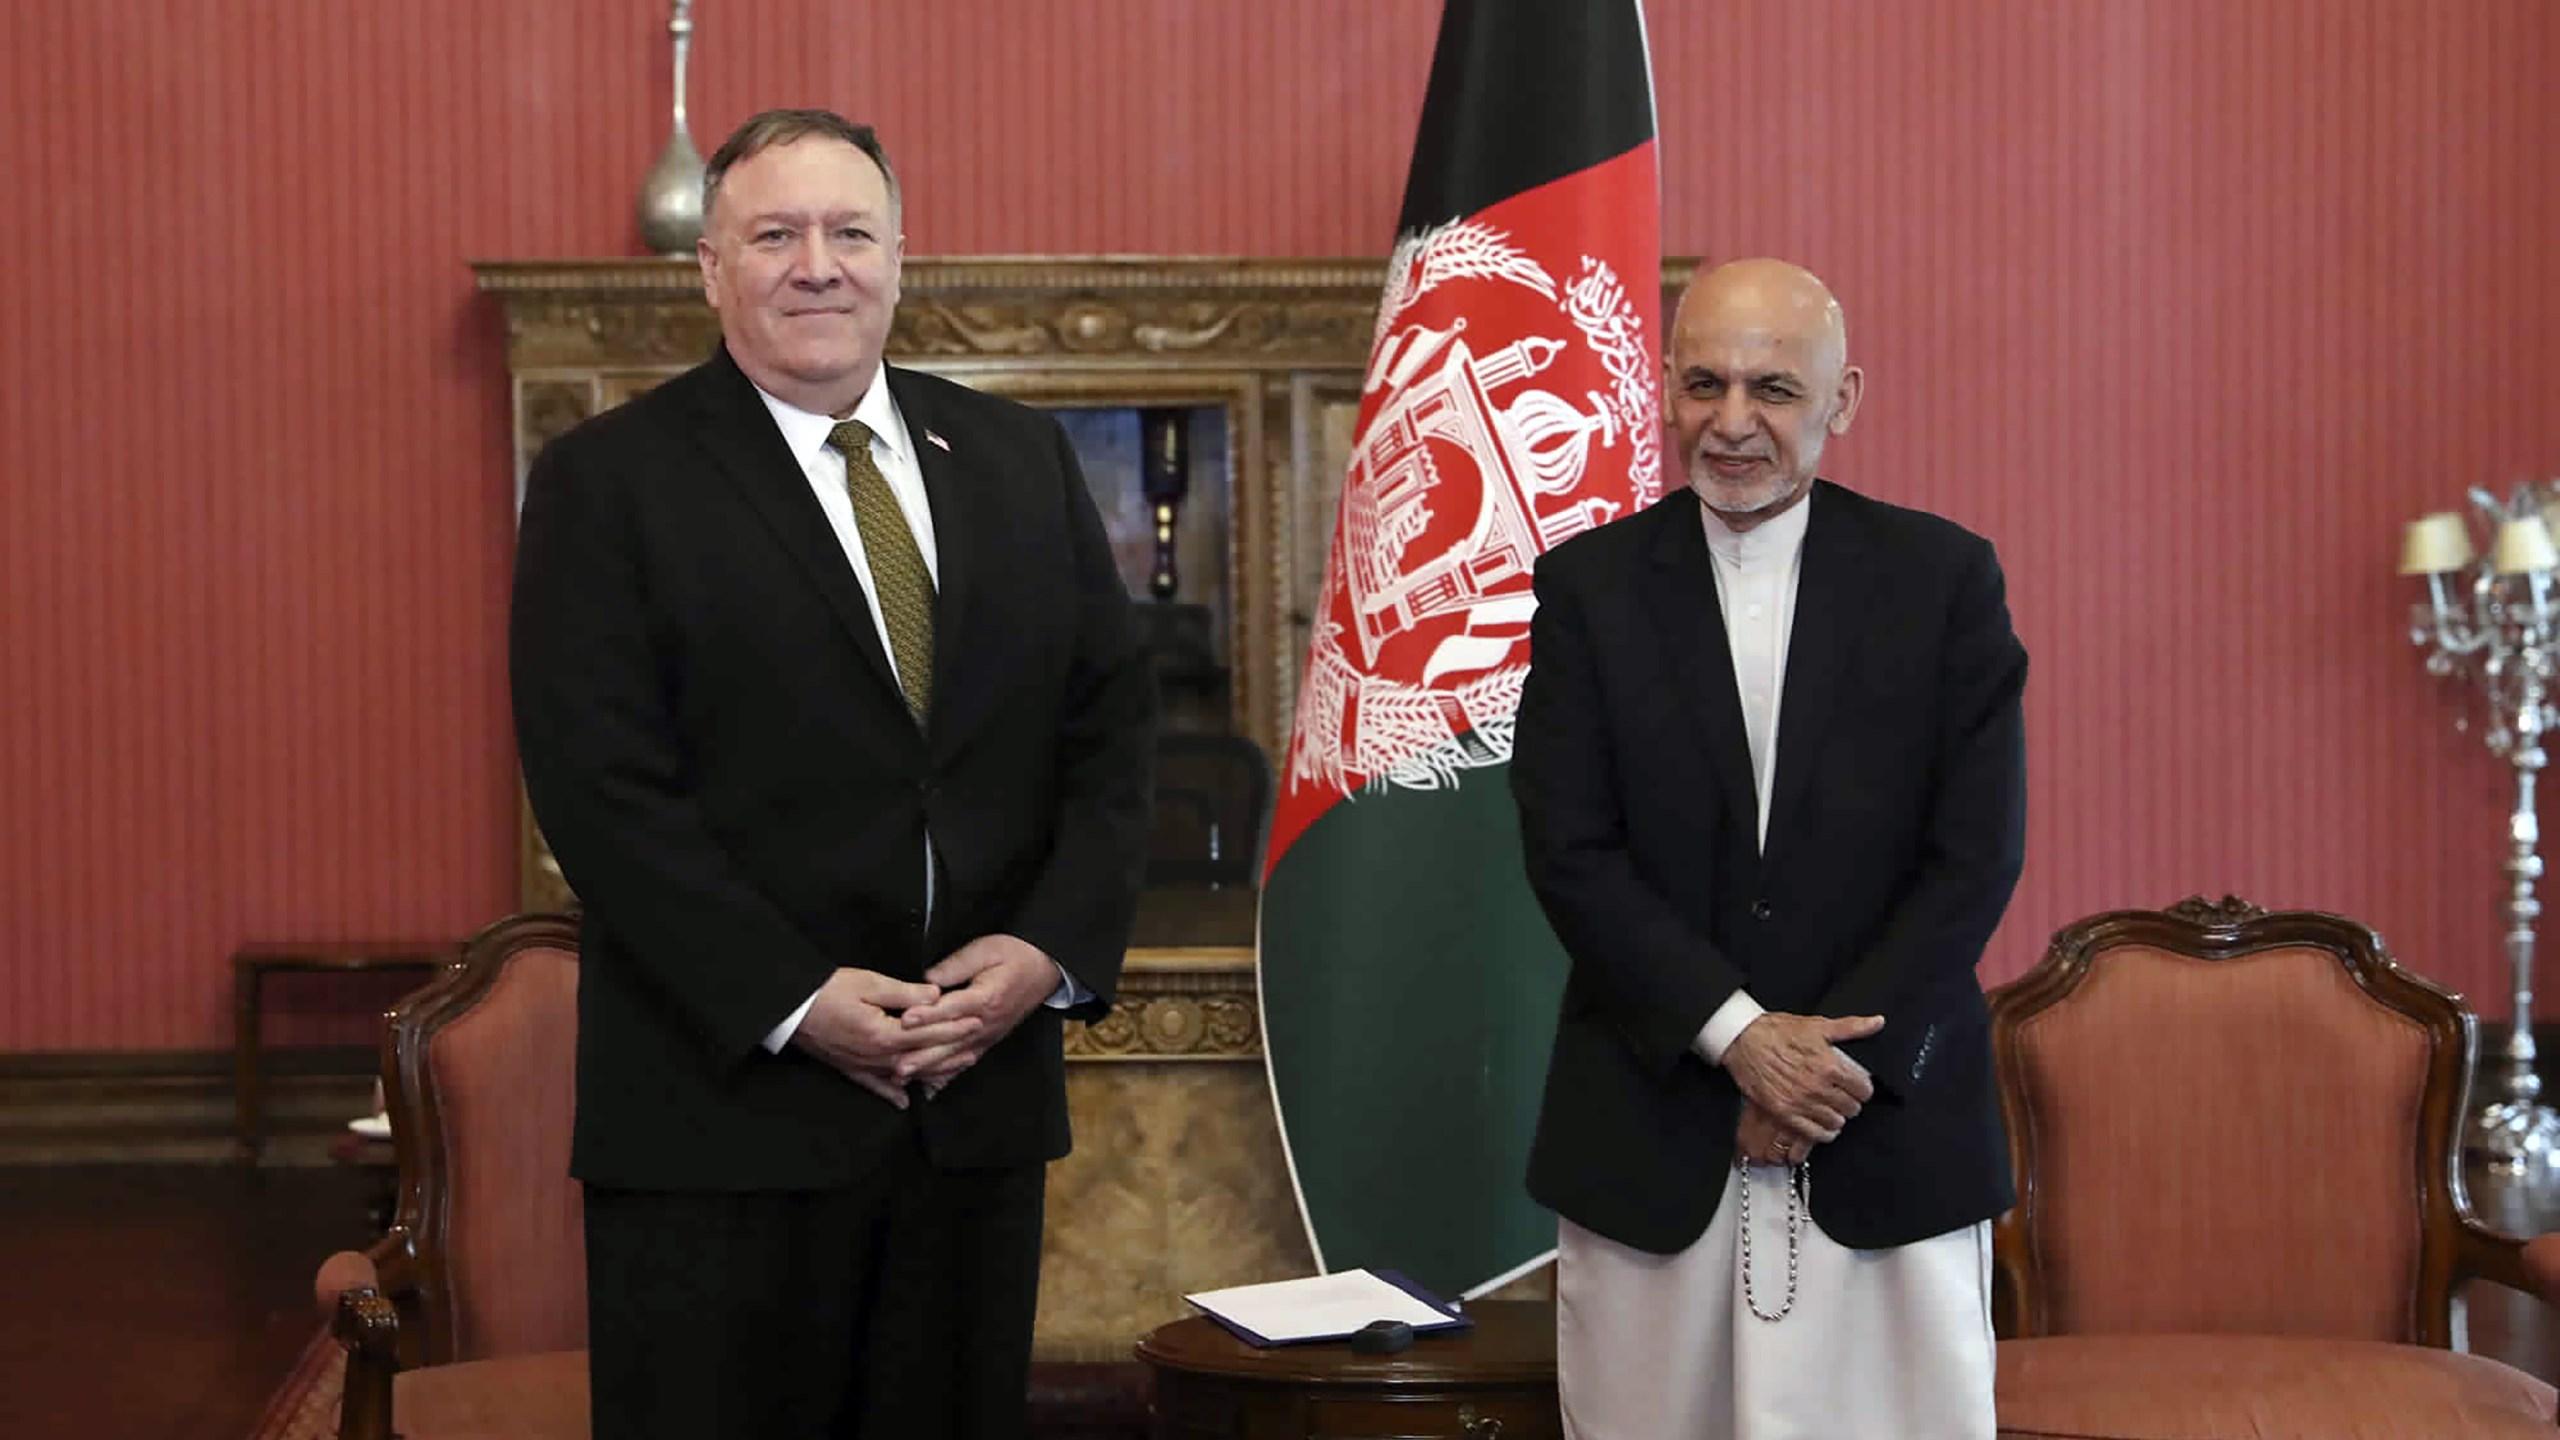 Mike Pompeo, Ashraf Ghani